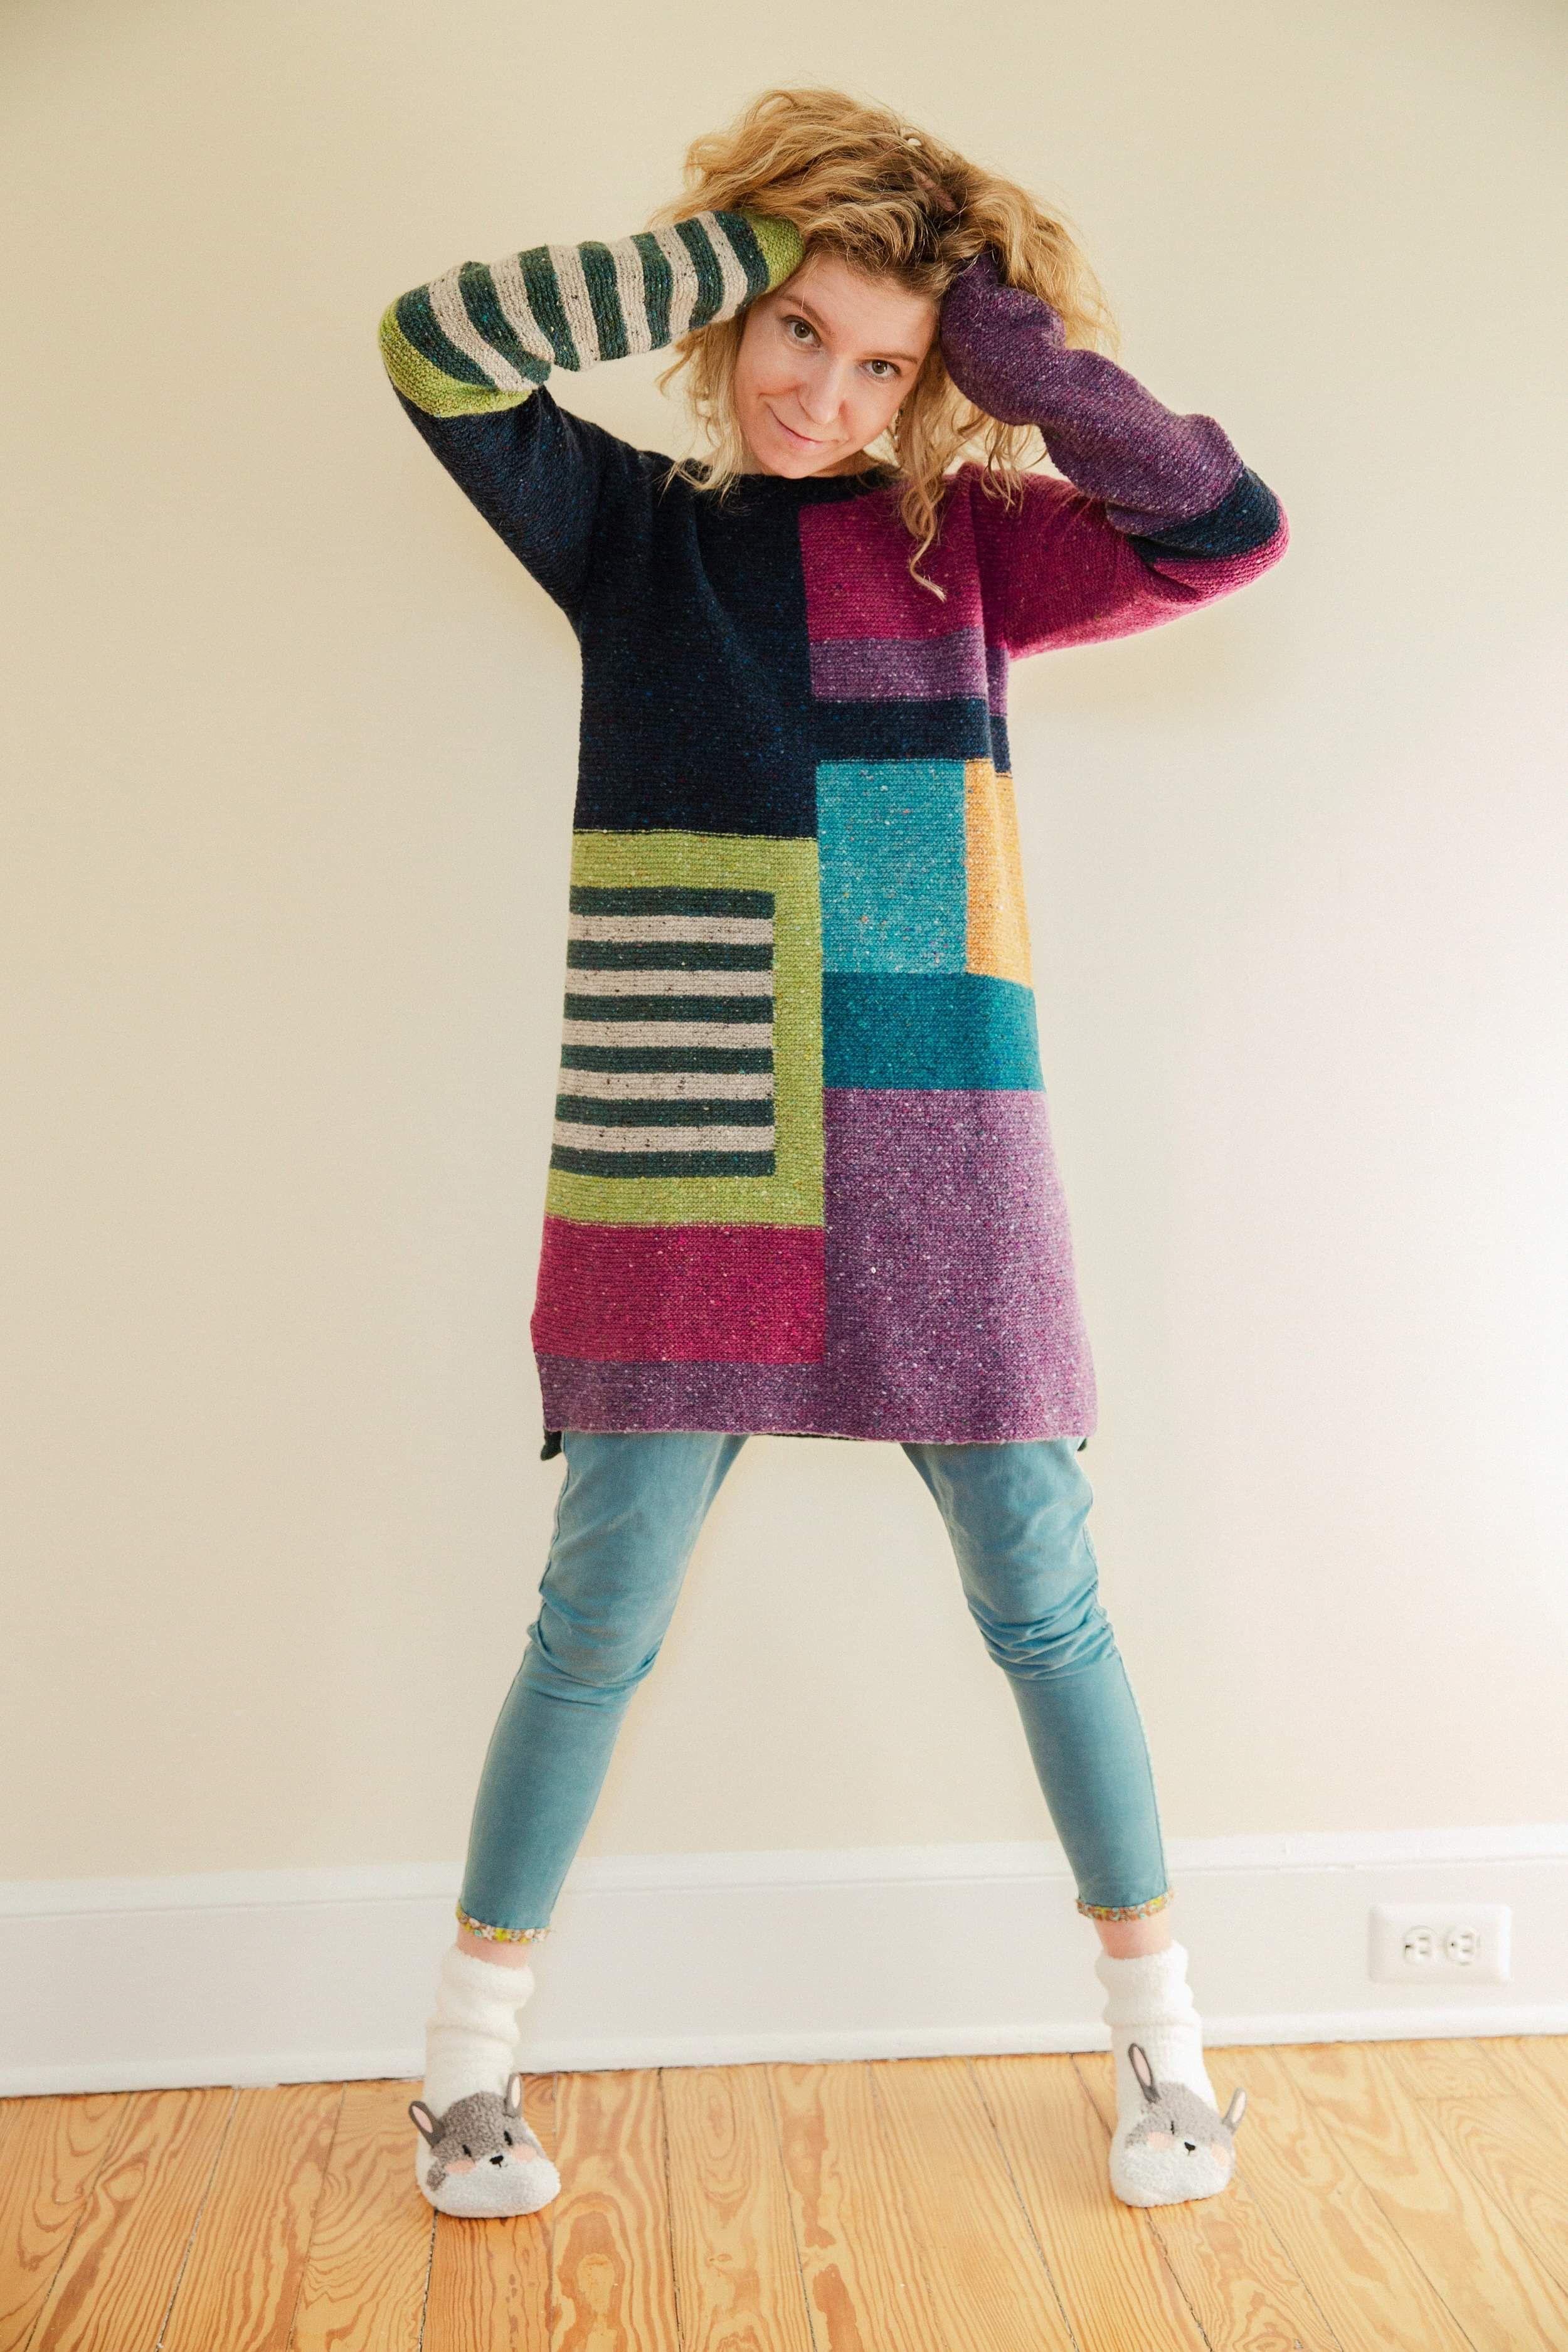 Wool Sweater Long Sweater Colorblock Dress Knitted Dress Size Xs S Knitting Designs Handmade Knitting Wool Sweater Dress [ 3750 x 2500 Pixel ]